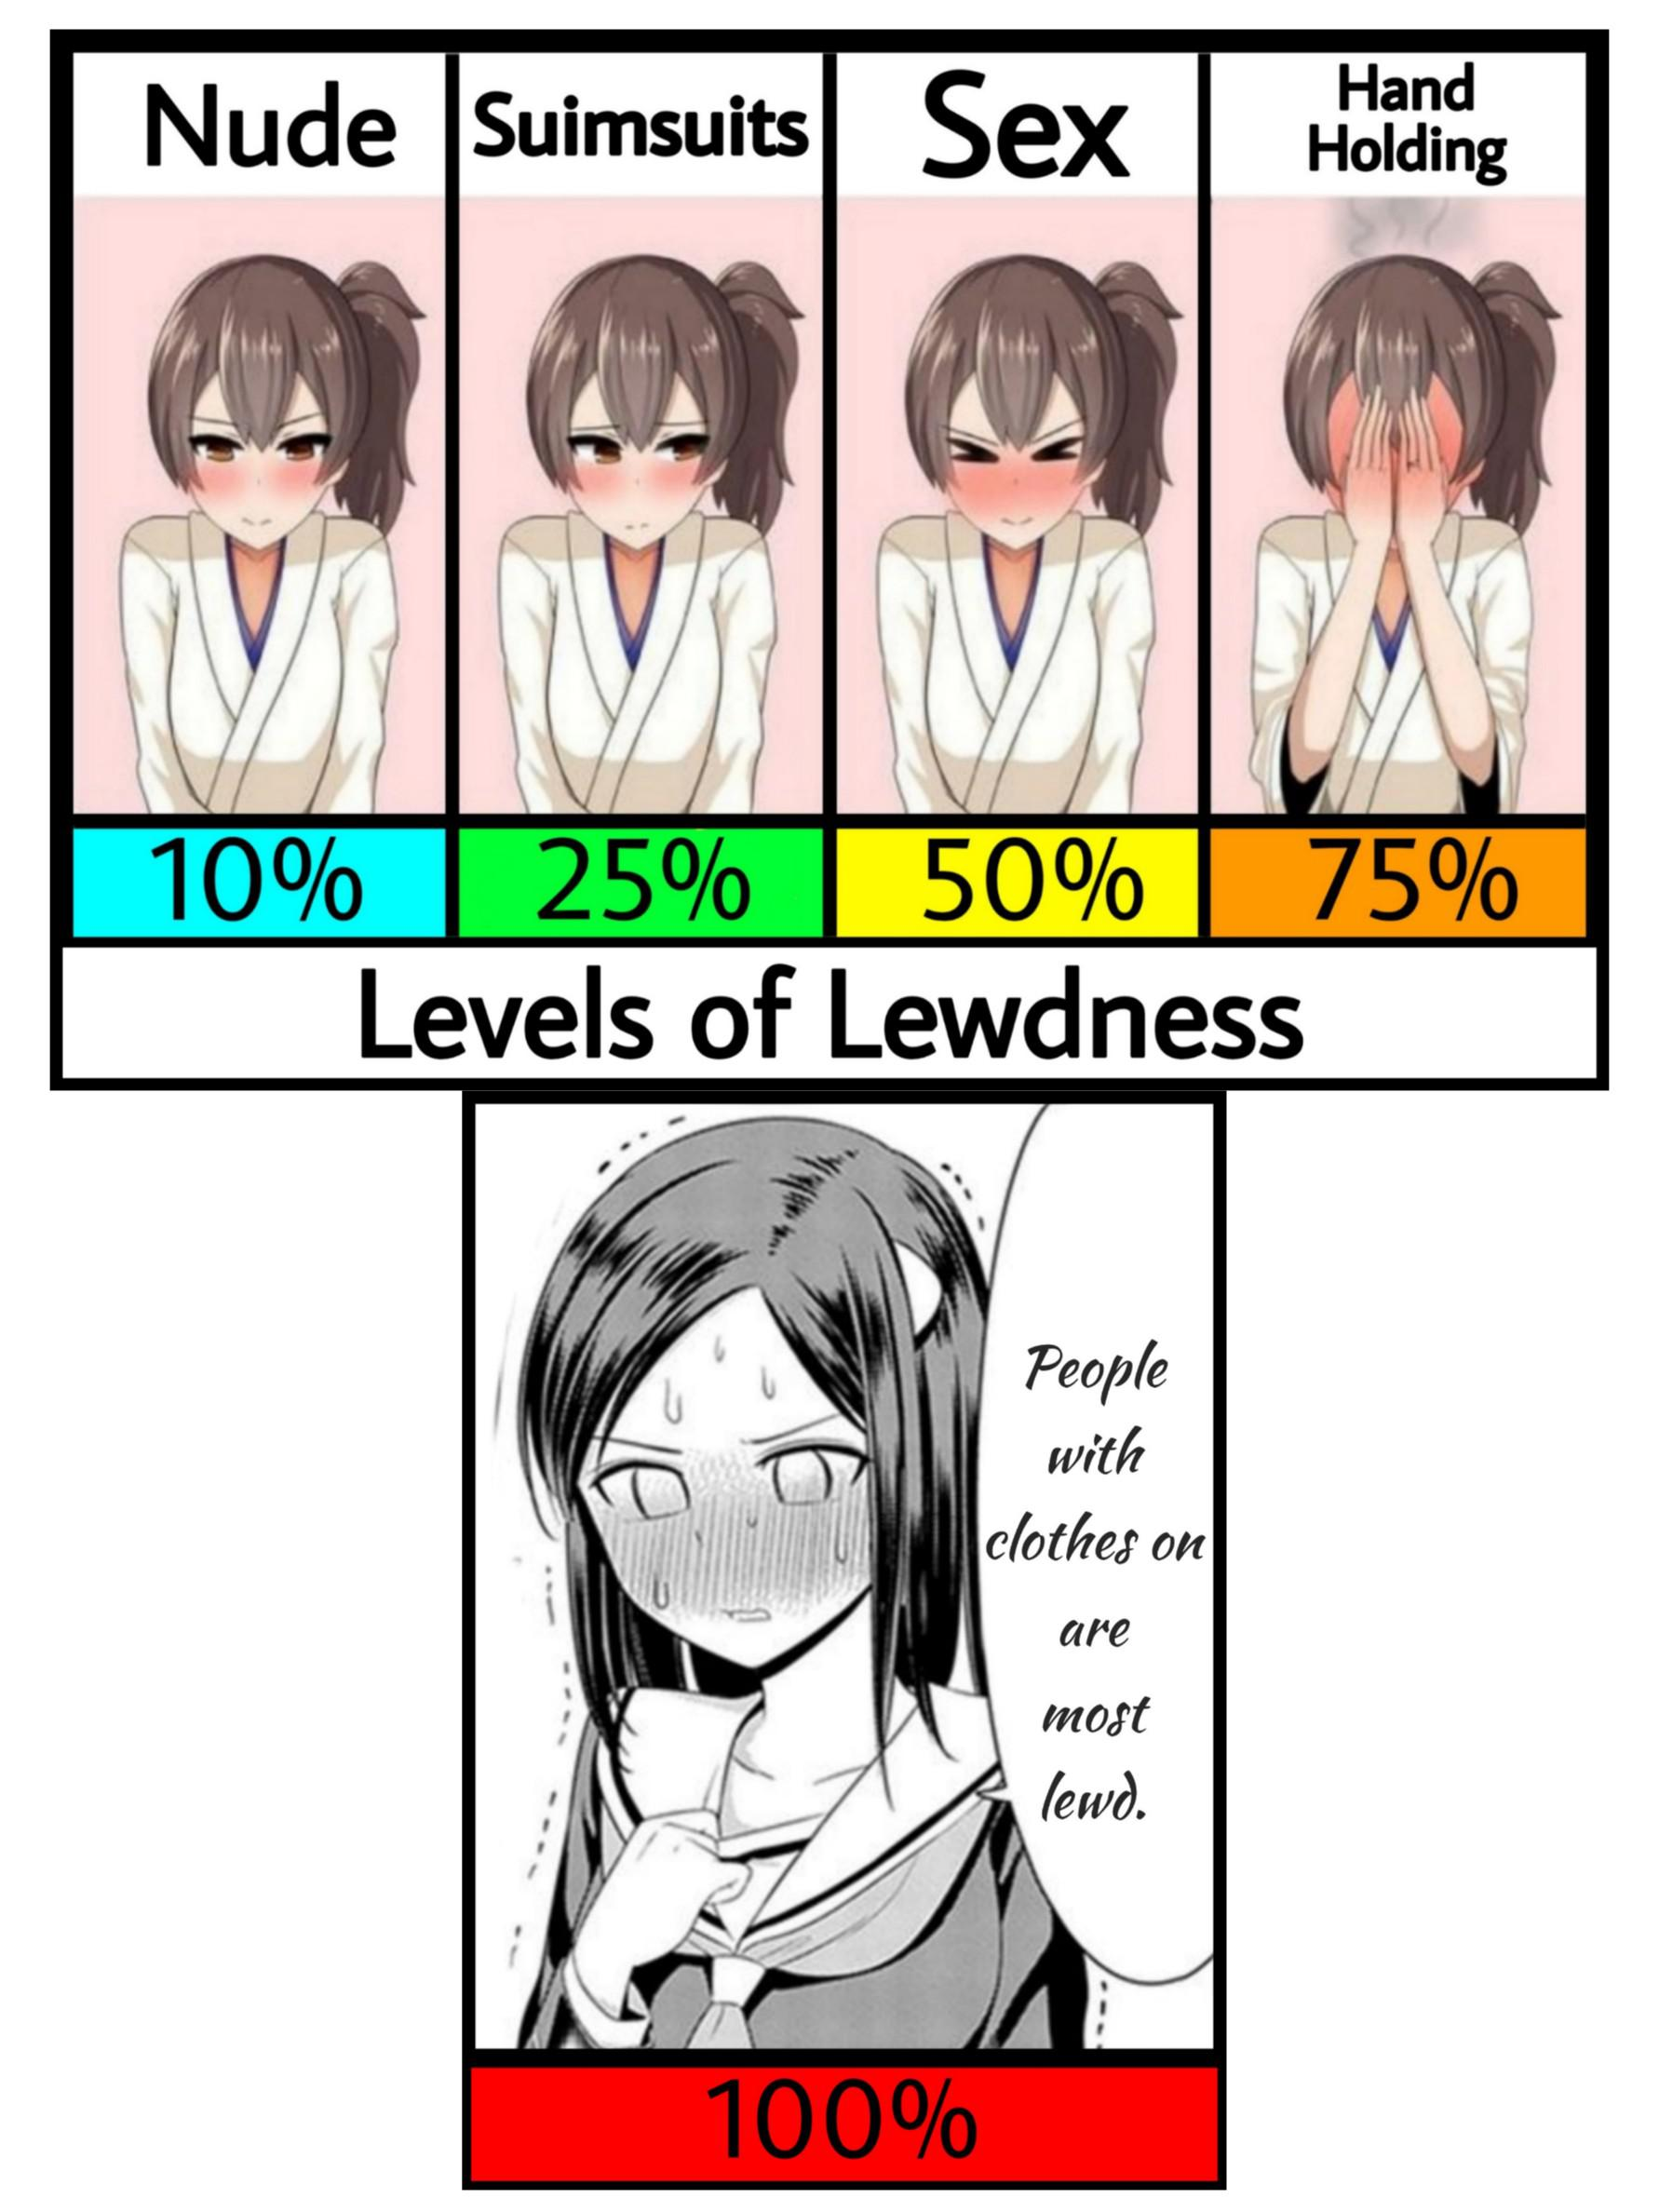 Lewd Anime Face Meme : anime, That's, Lewd,, Lewd., /r/Animemes